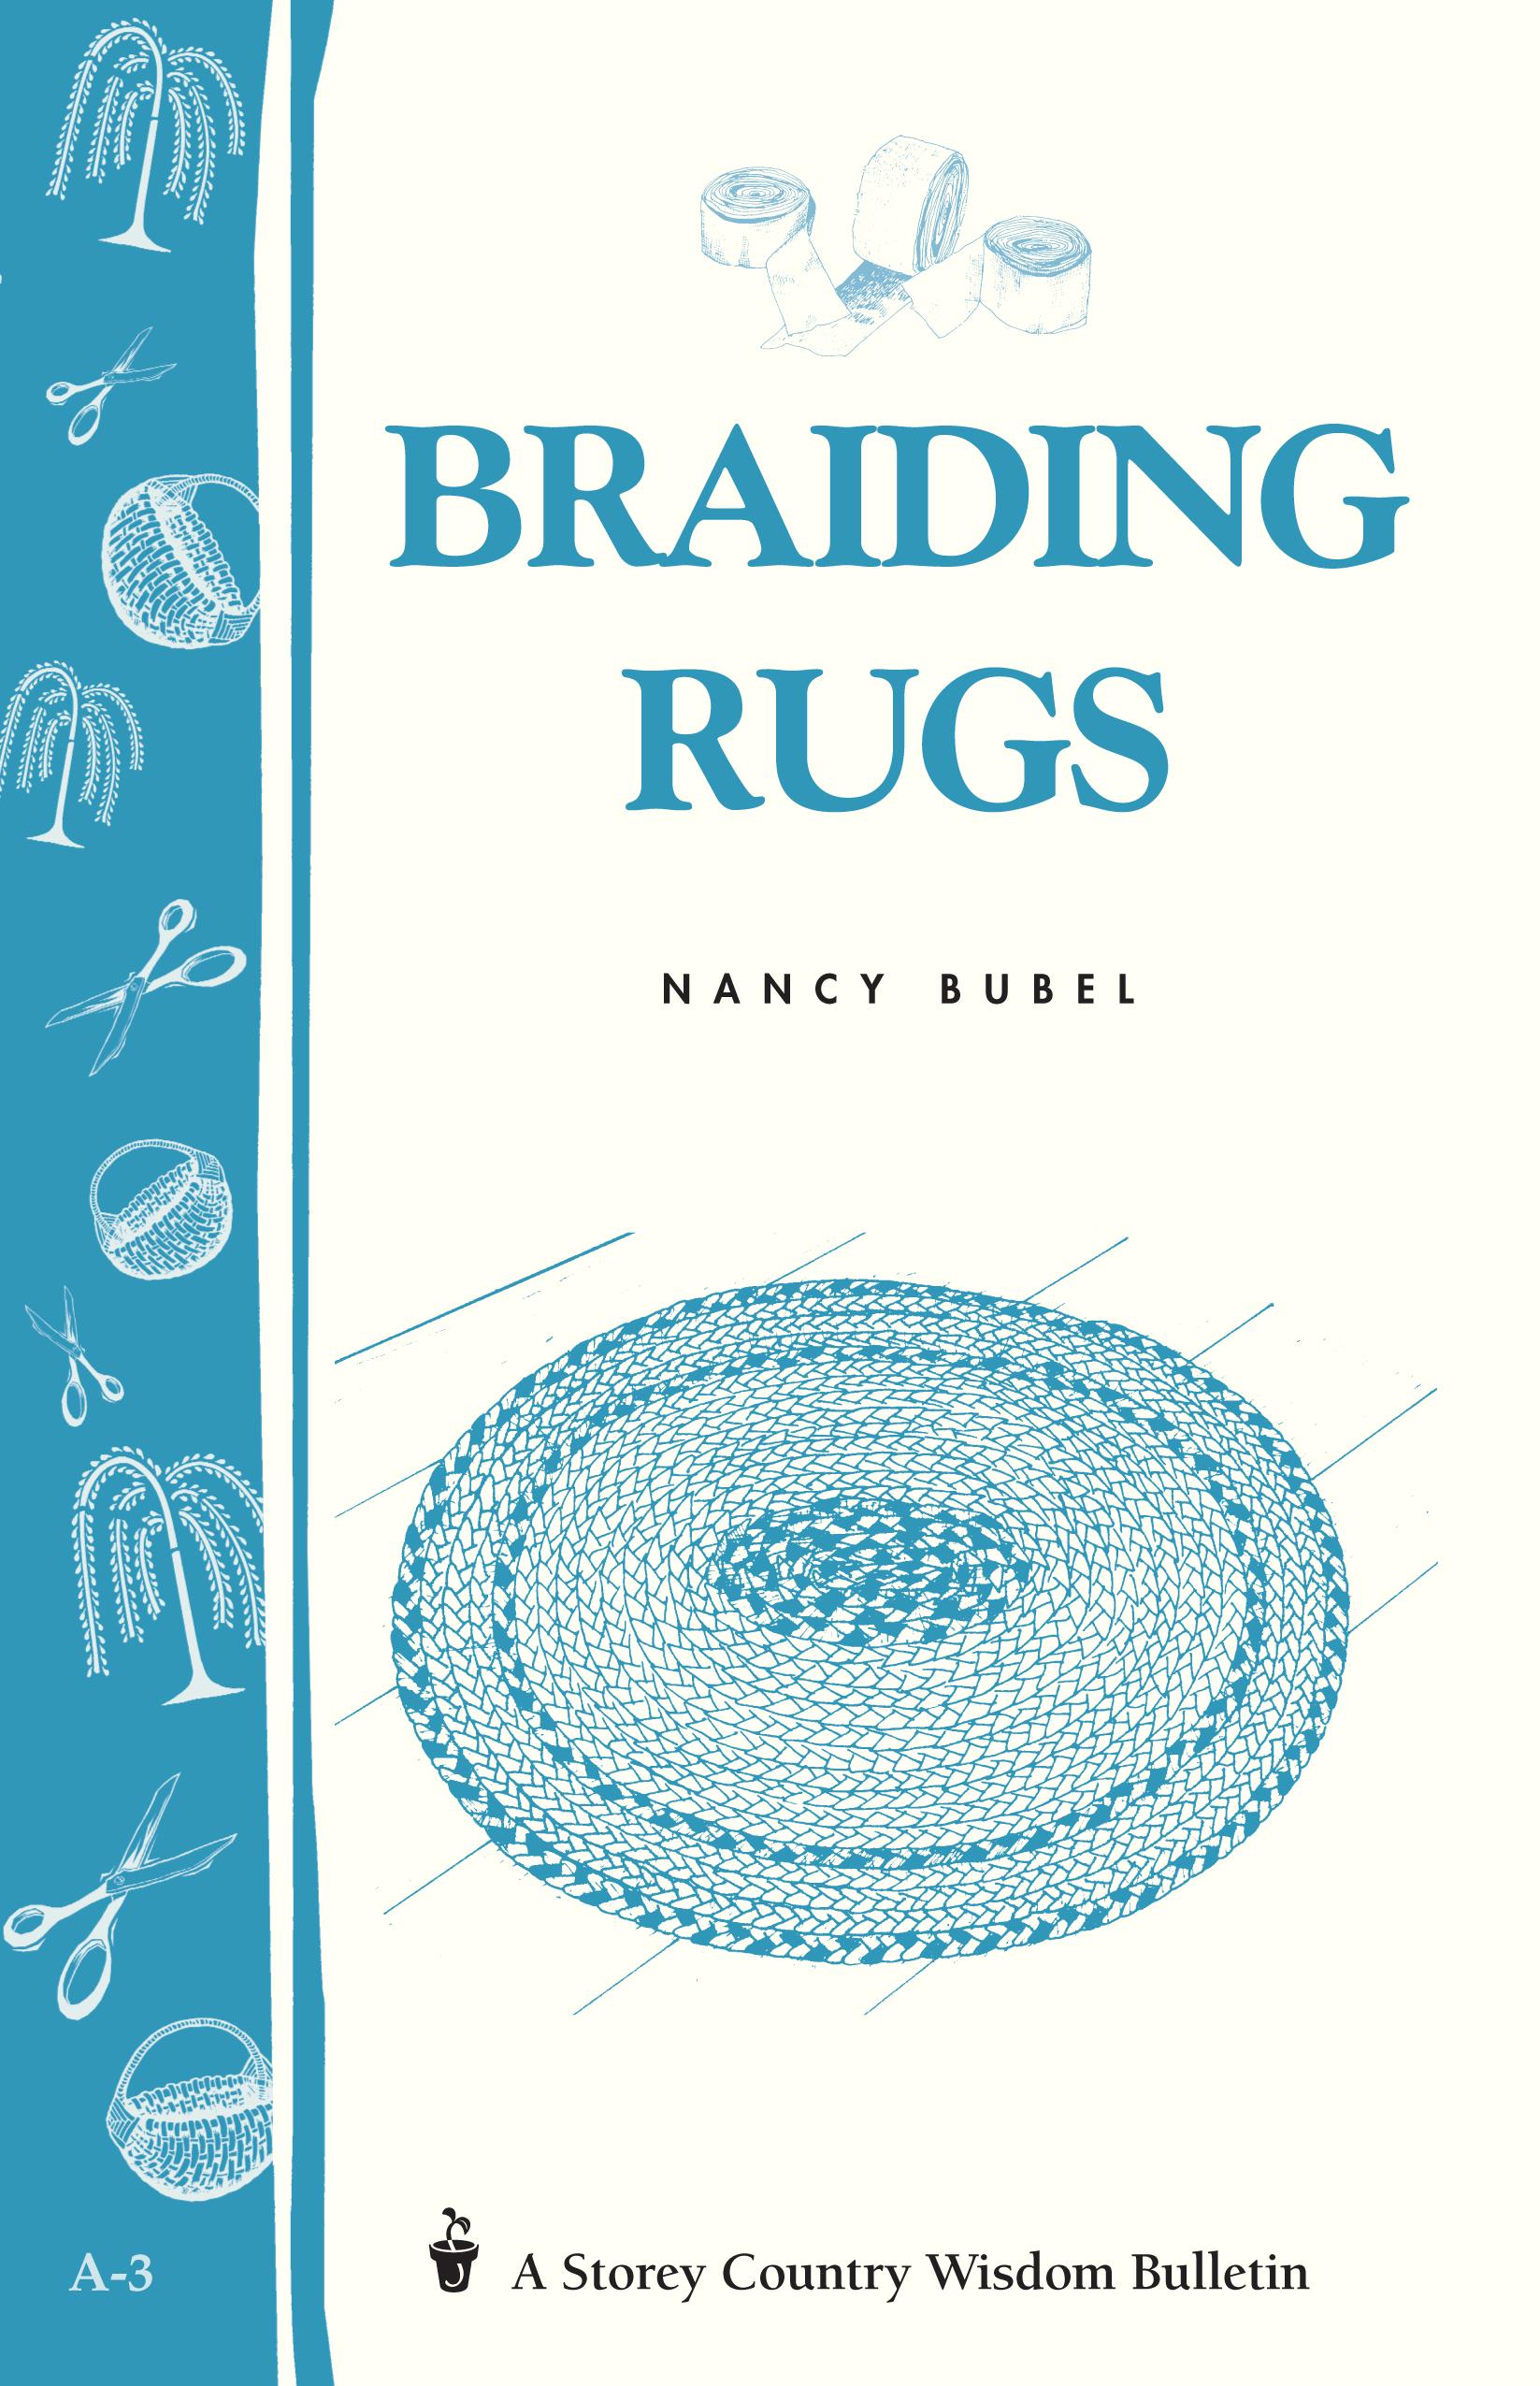 Braiding Rugs A Storey Country Wisdom Bulletin A-03 - Nancy Bubel